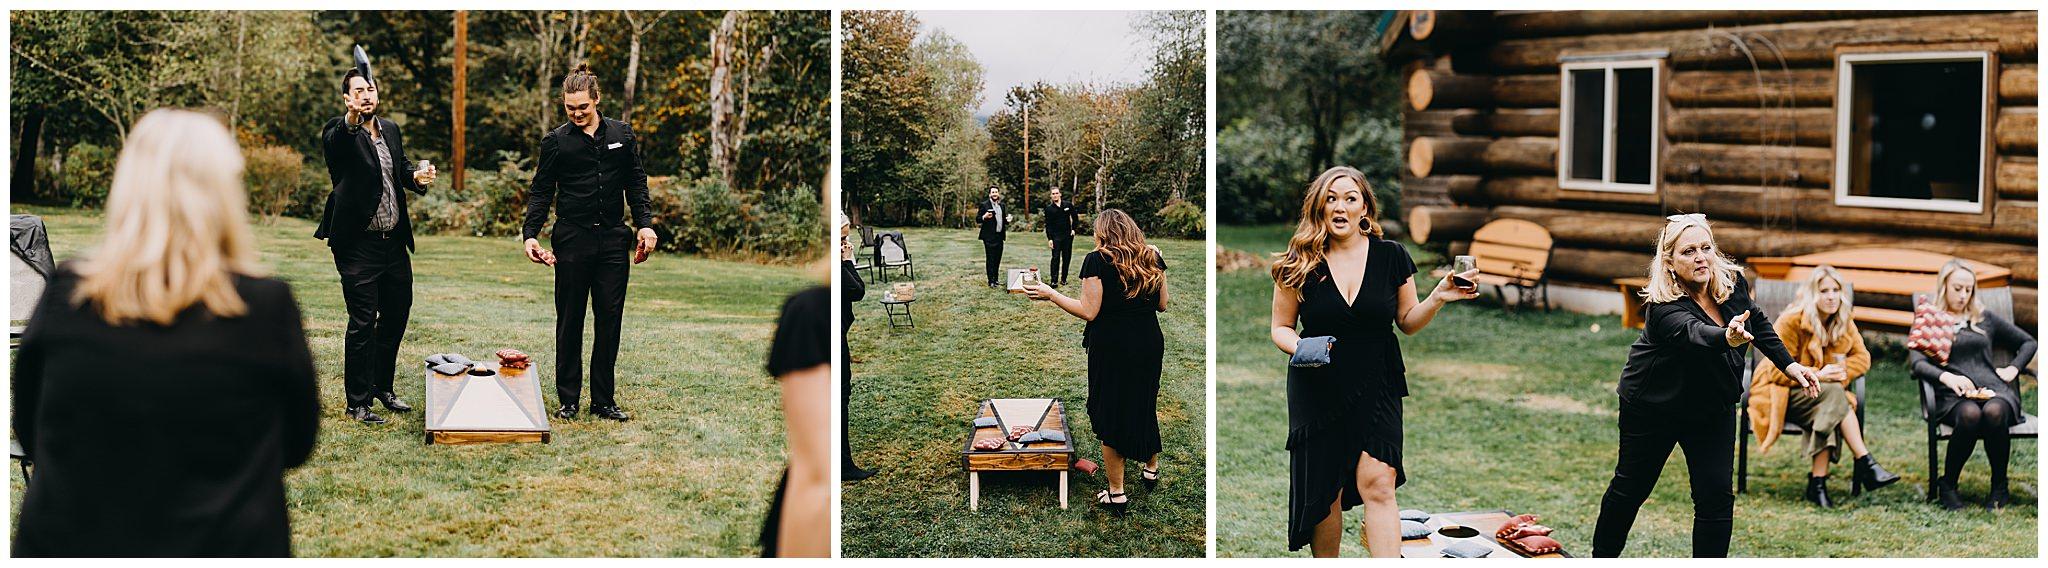 wallace-falls-lodge-wedding-evan-kelsey79.jpg